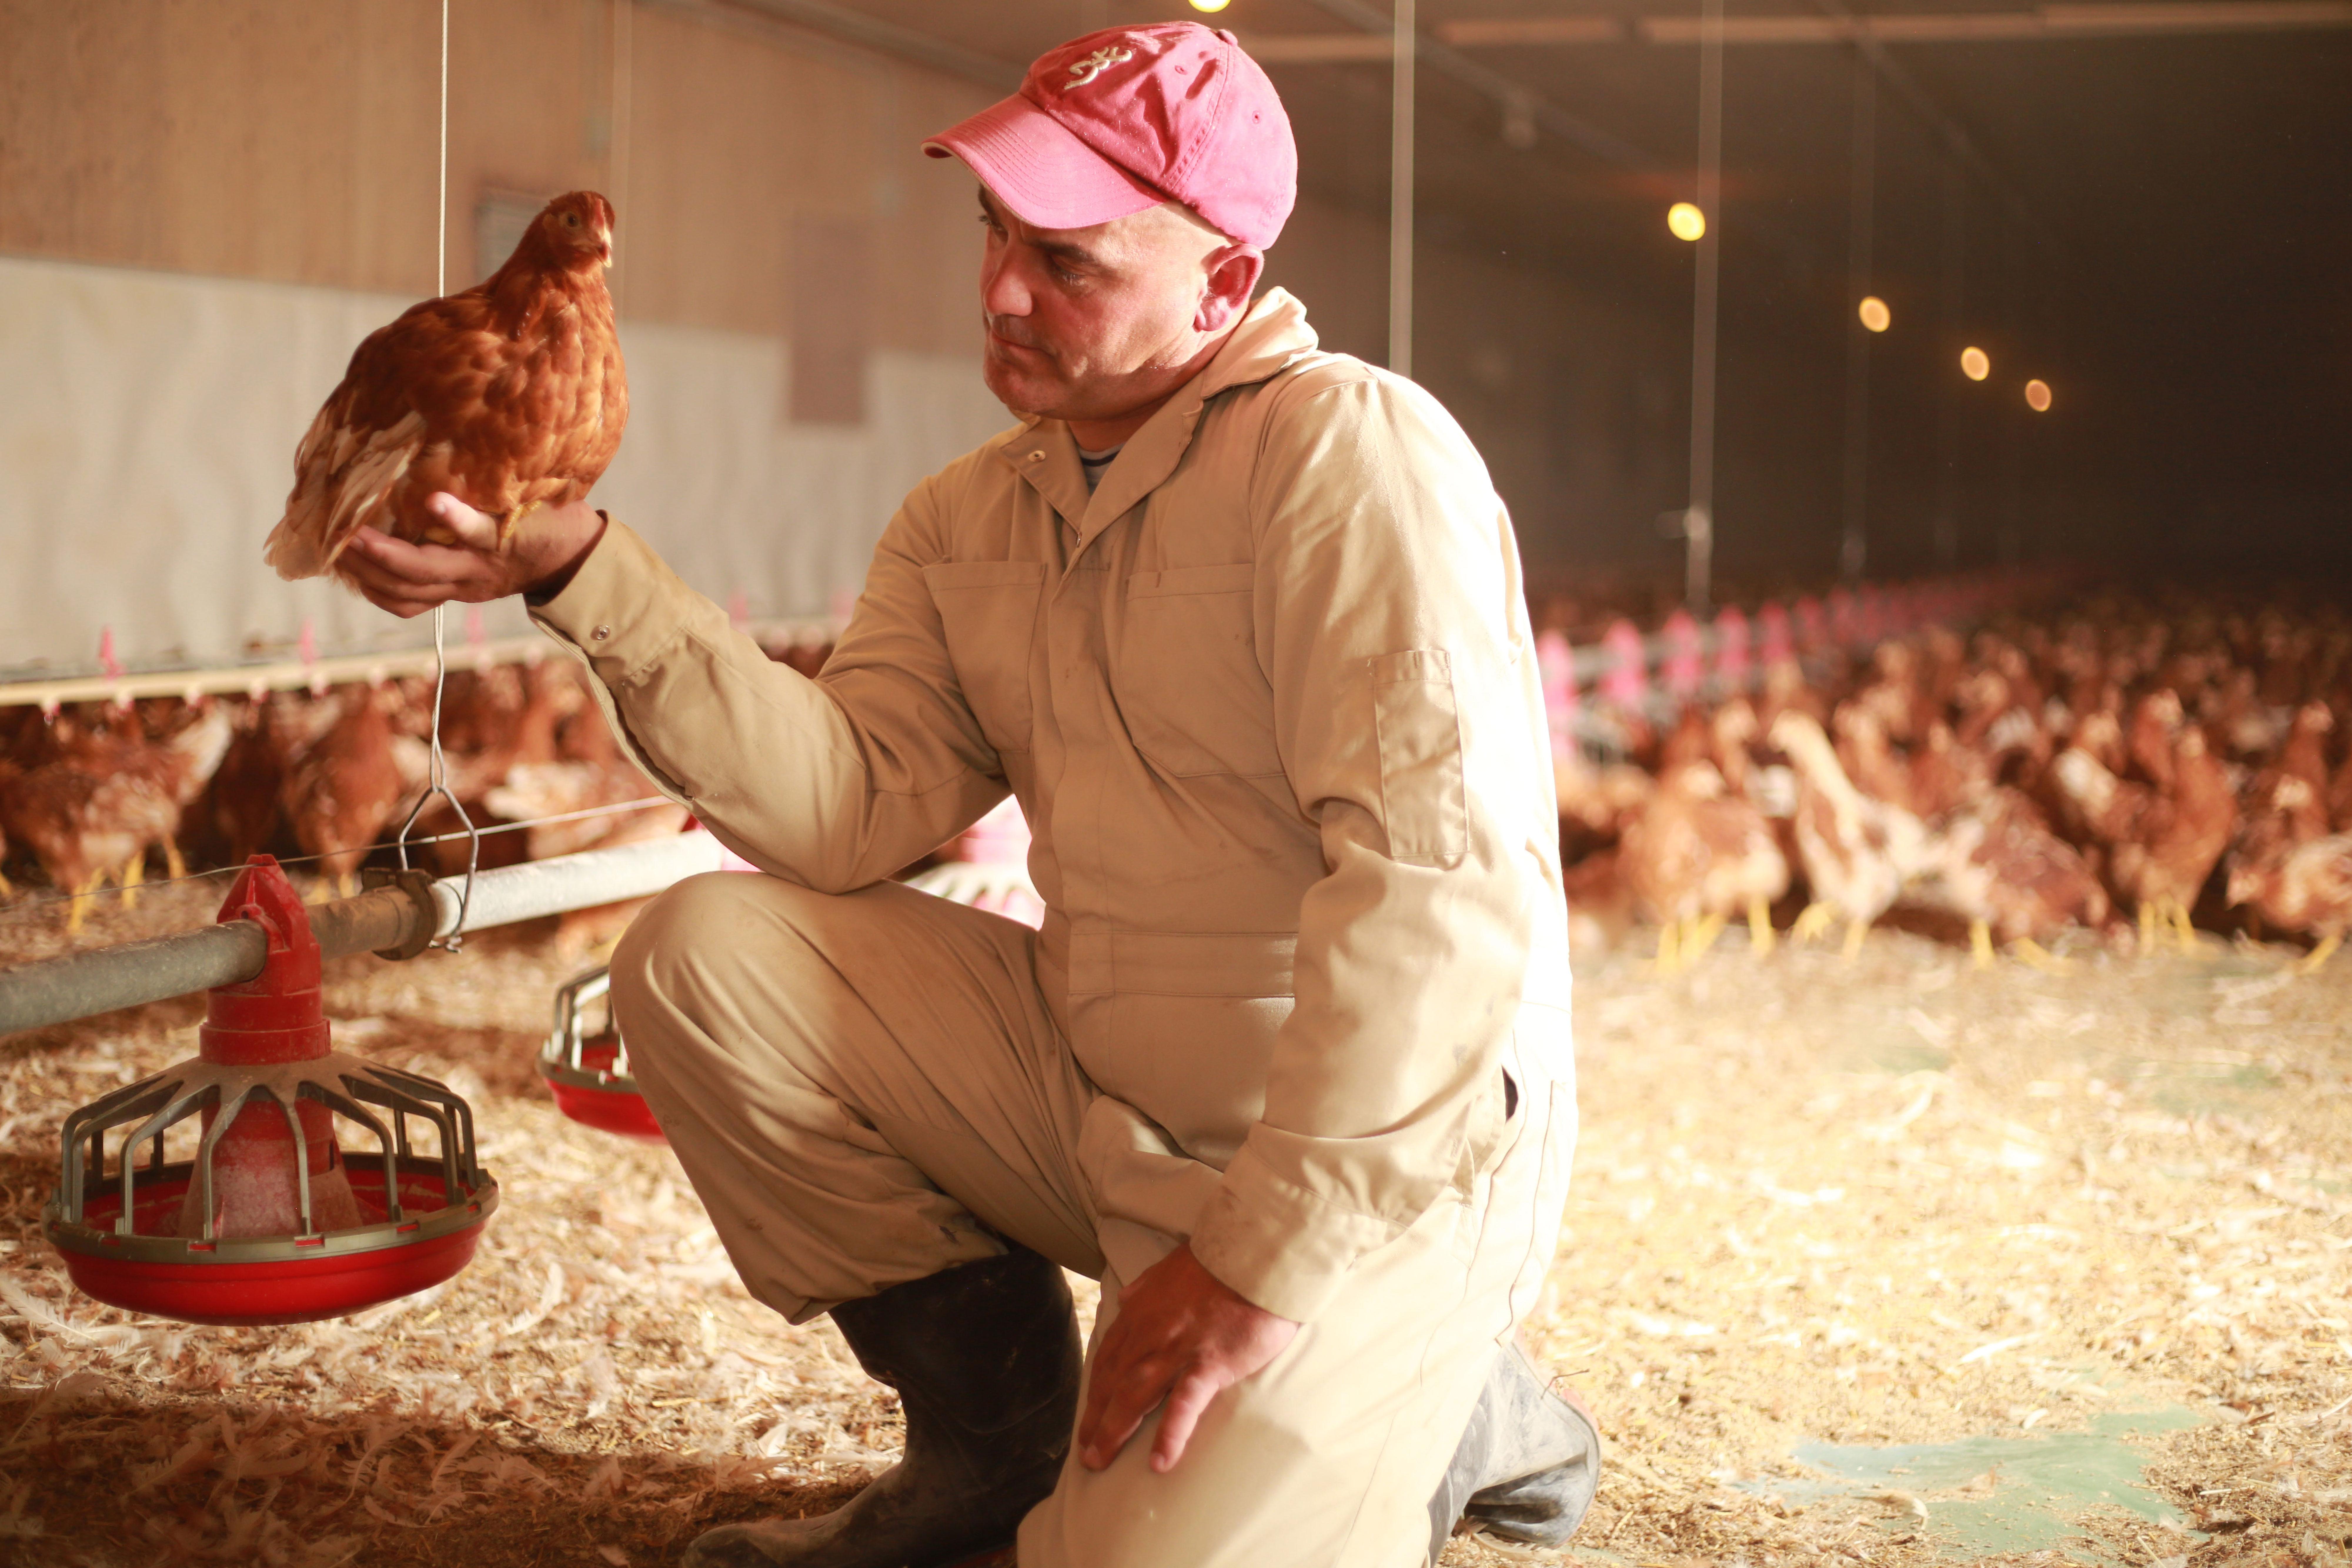 Farmer in chicken barn looking at brown hen